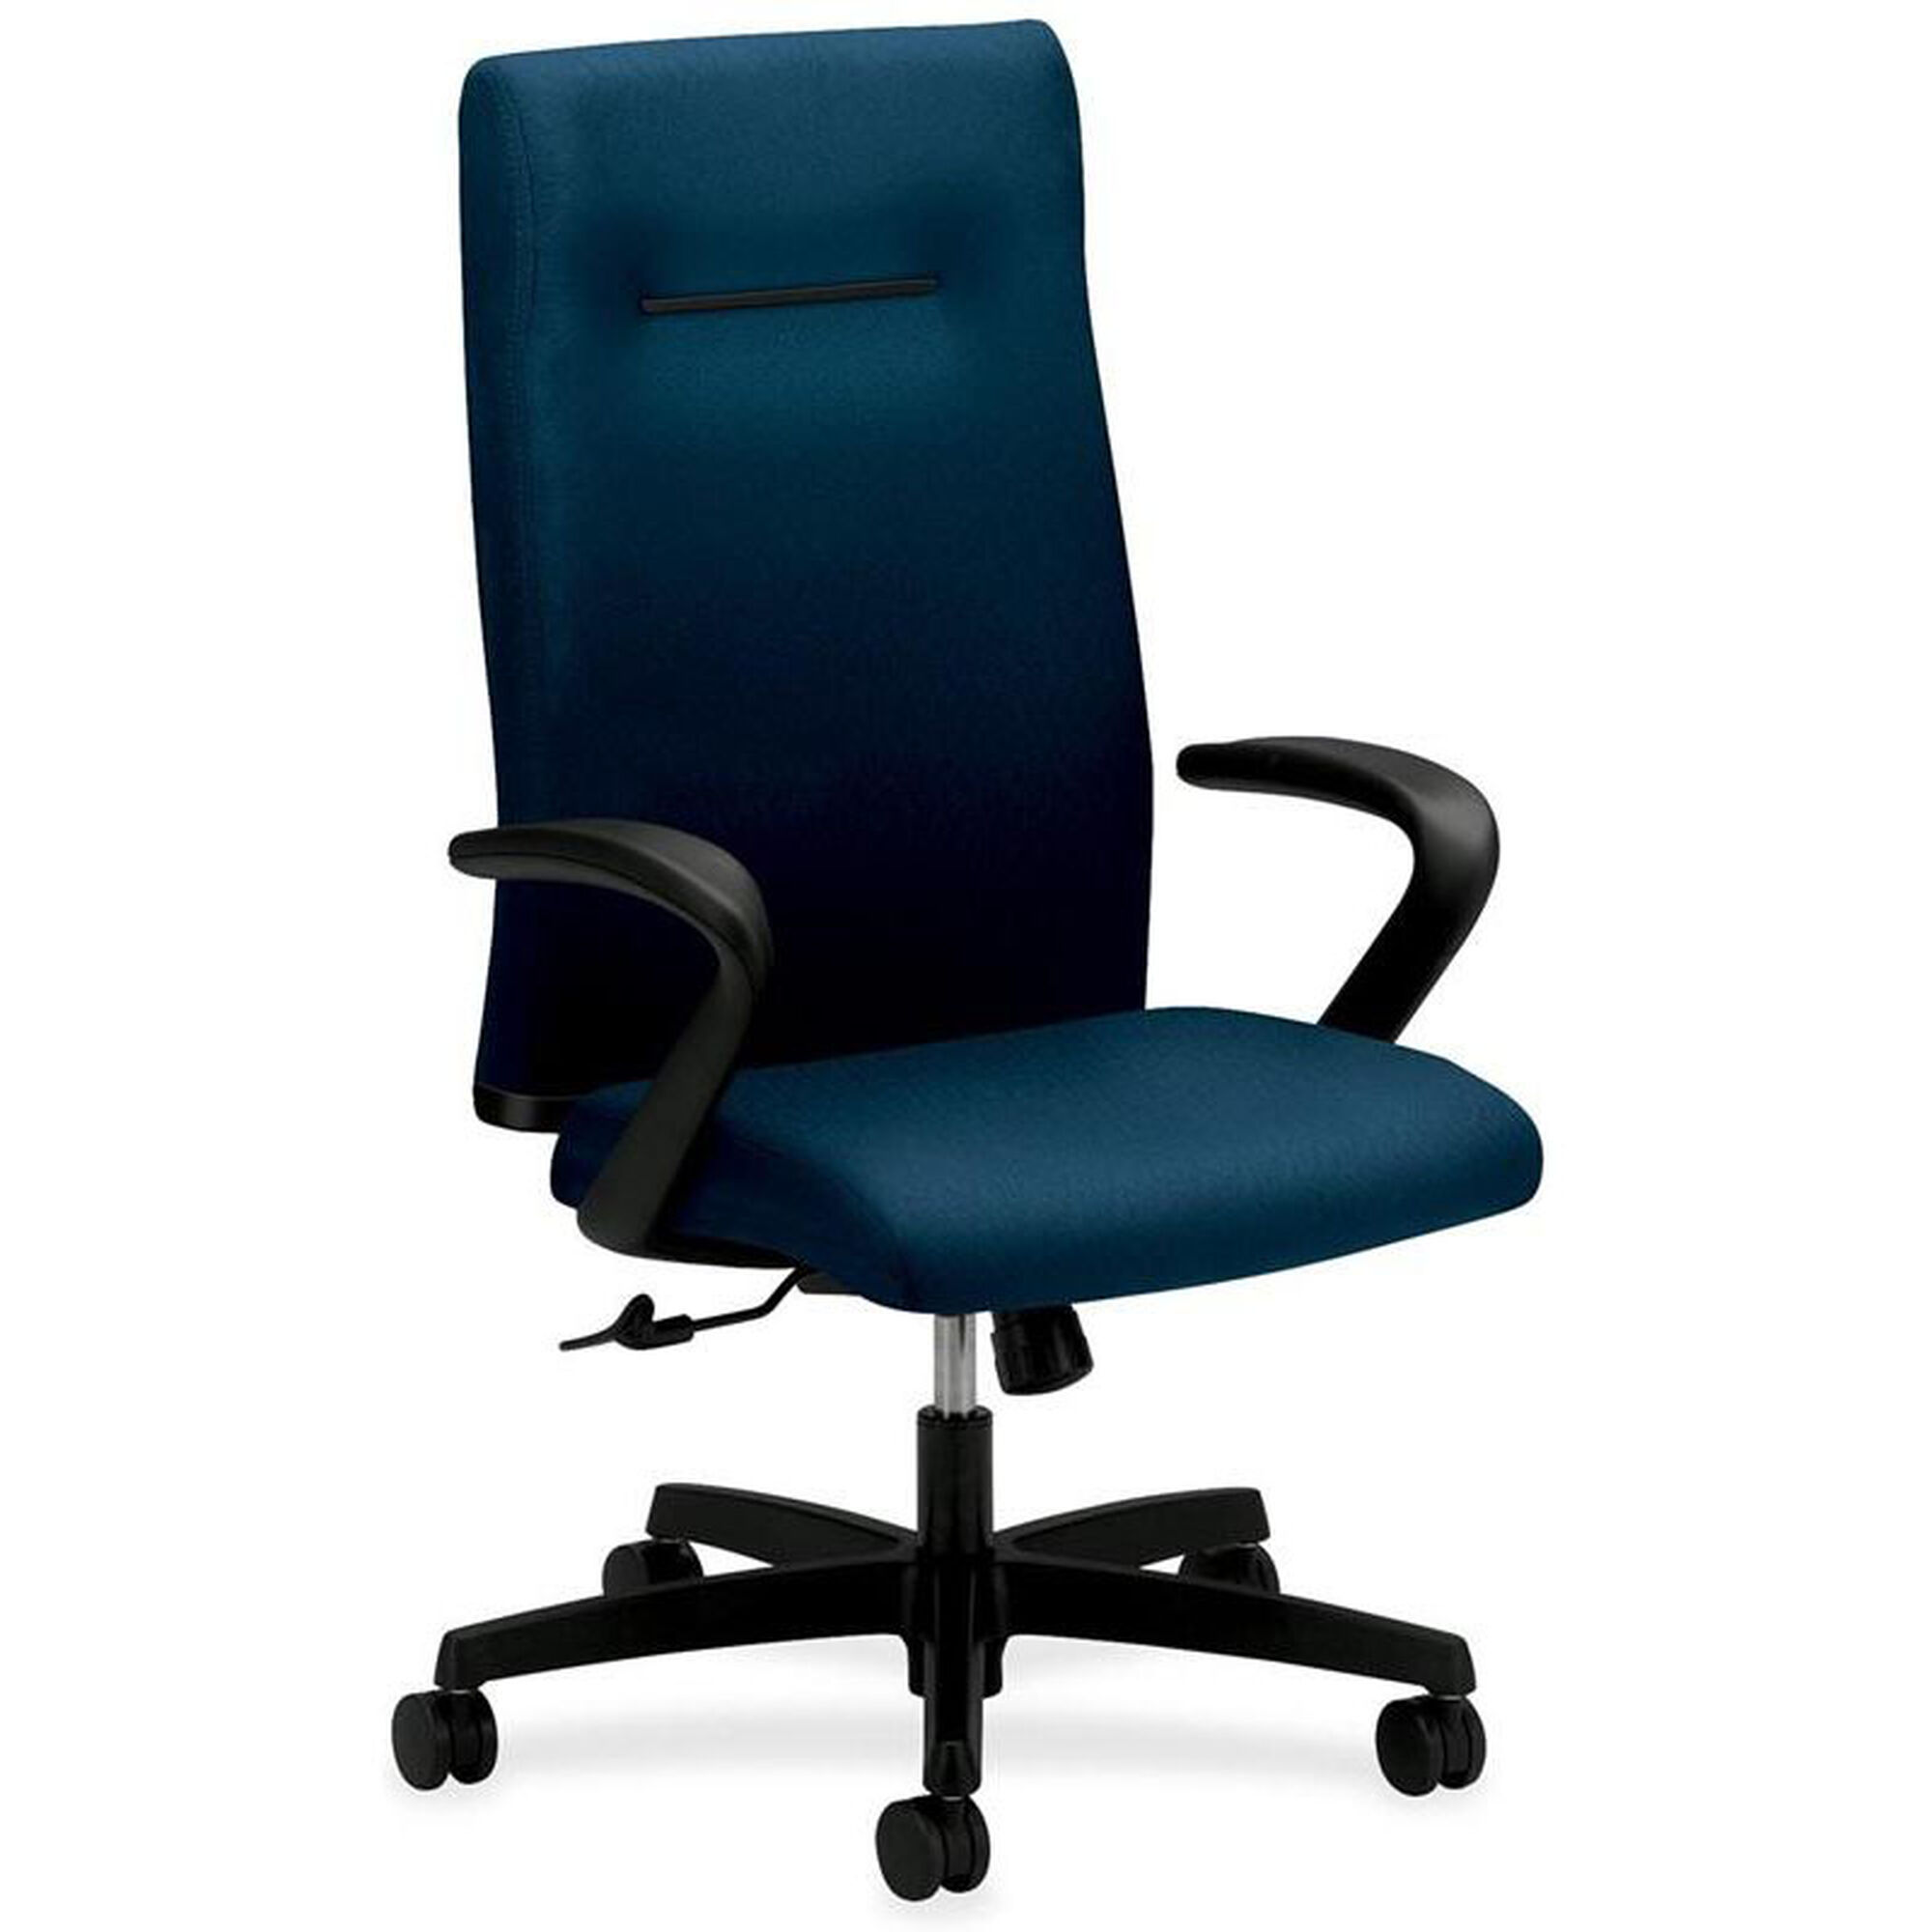 Hon The Hon Company Ignition Seating High Back Executive